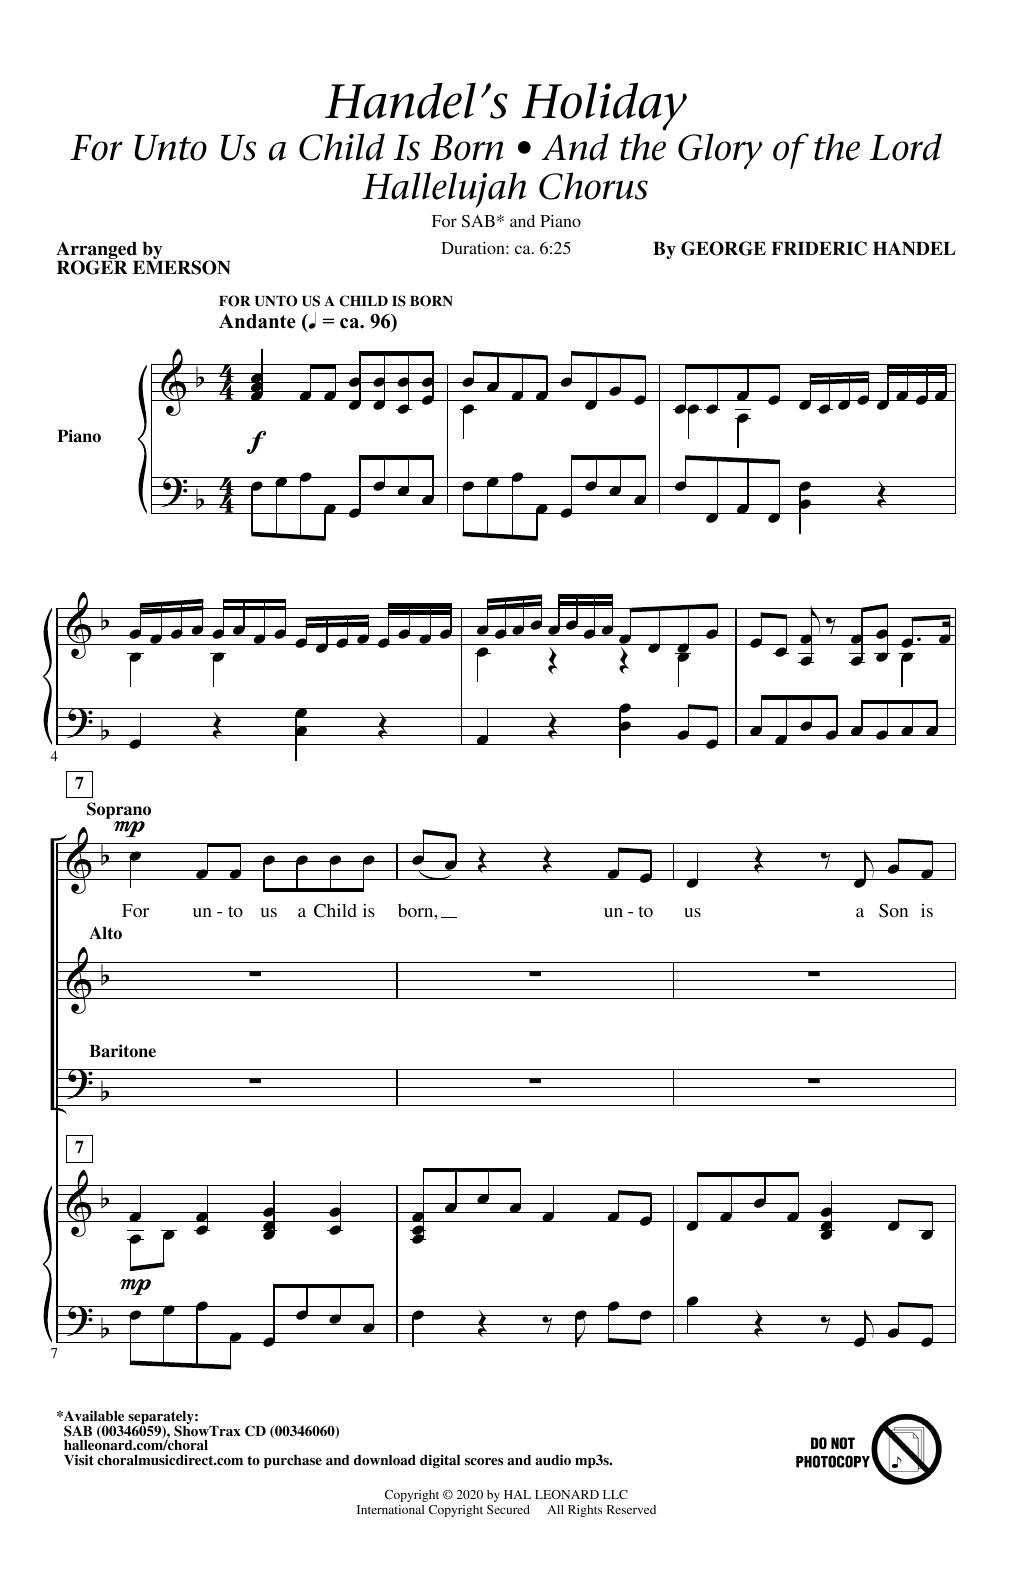 Handel's Holiday (arr. Roger Emerson) Sheet Music